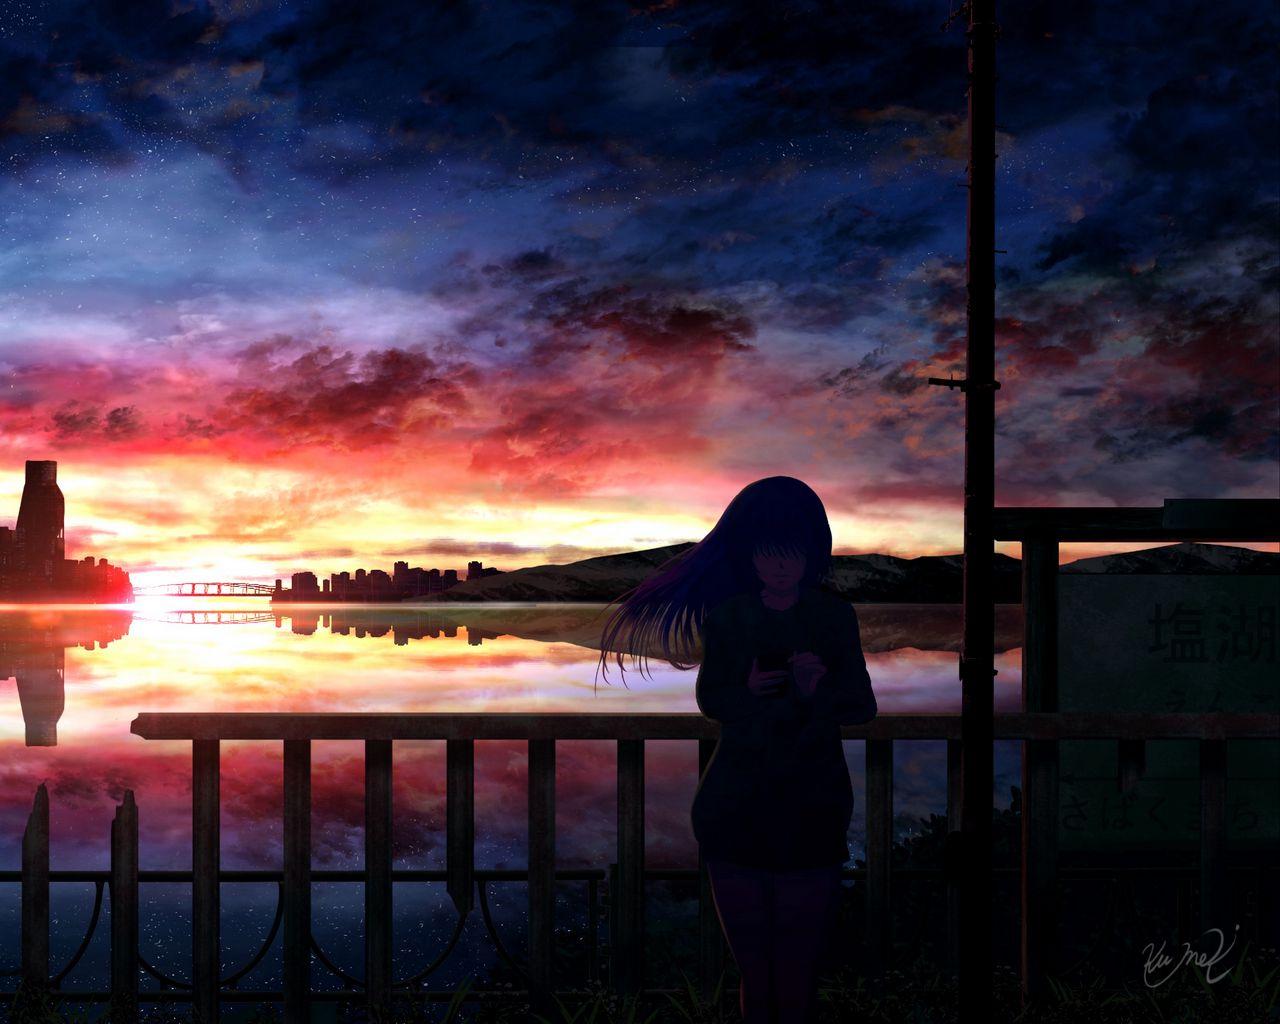 1280x1024 Wallpaper silhouette, night, starry sky, girl, anime